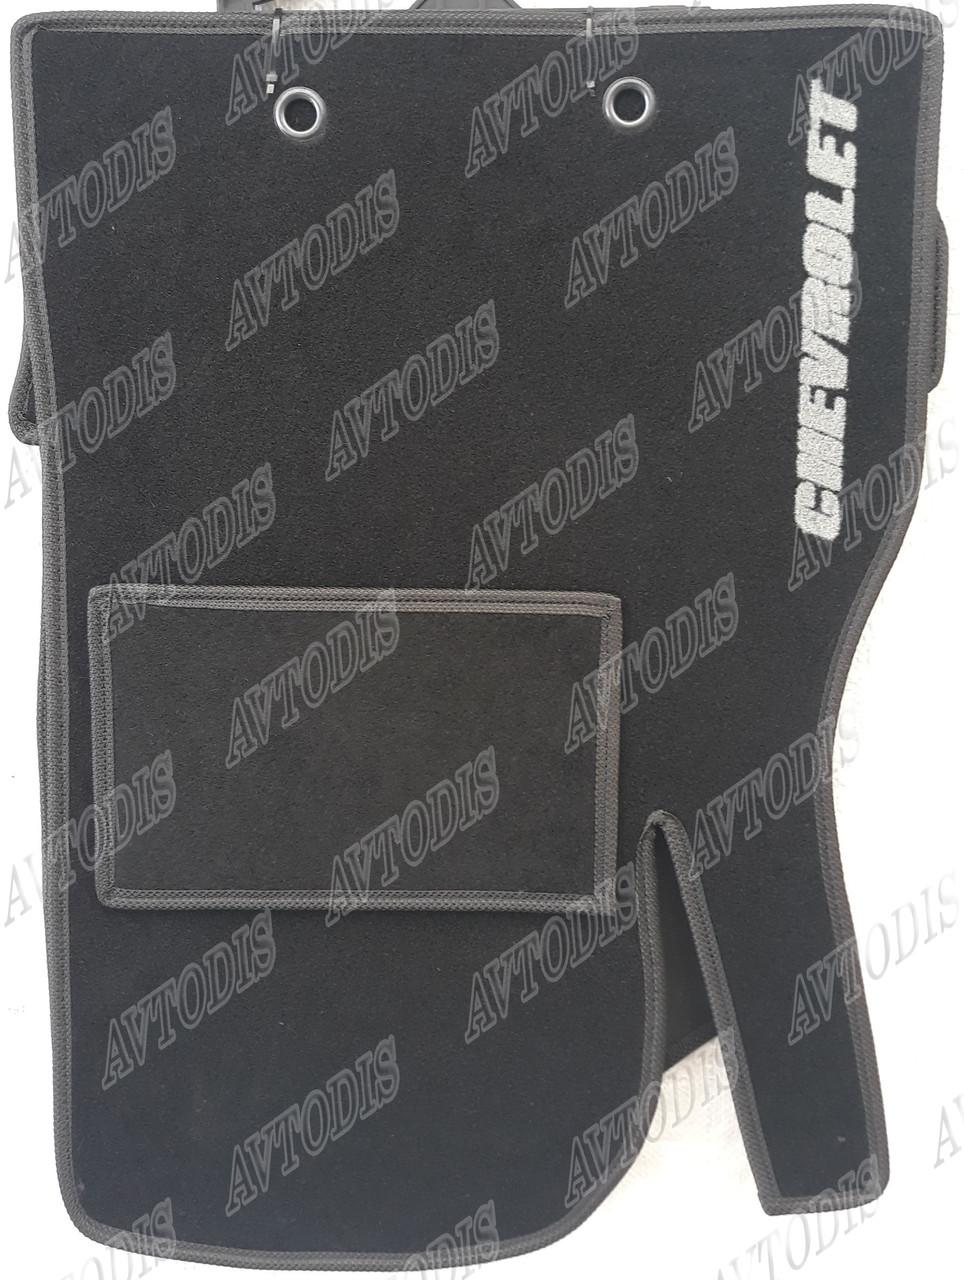 Ворсовые коврики Chevrolet Lacetti 2004- VIP ЛЮКС АВТО-ВОРС